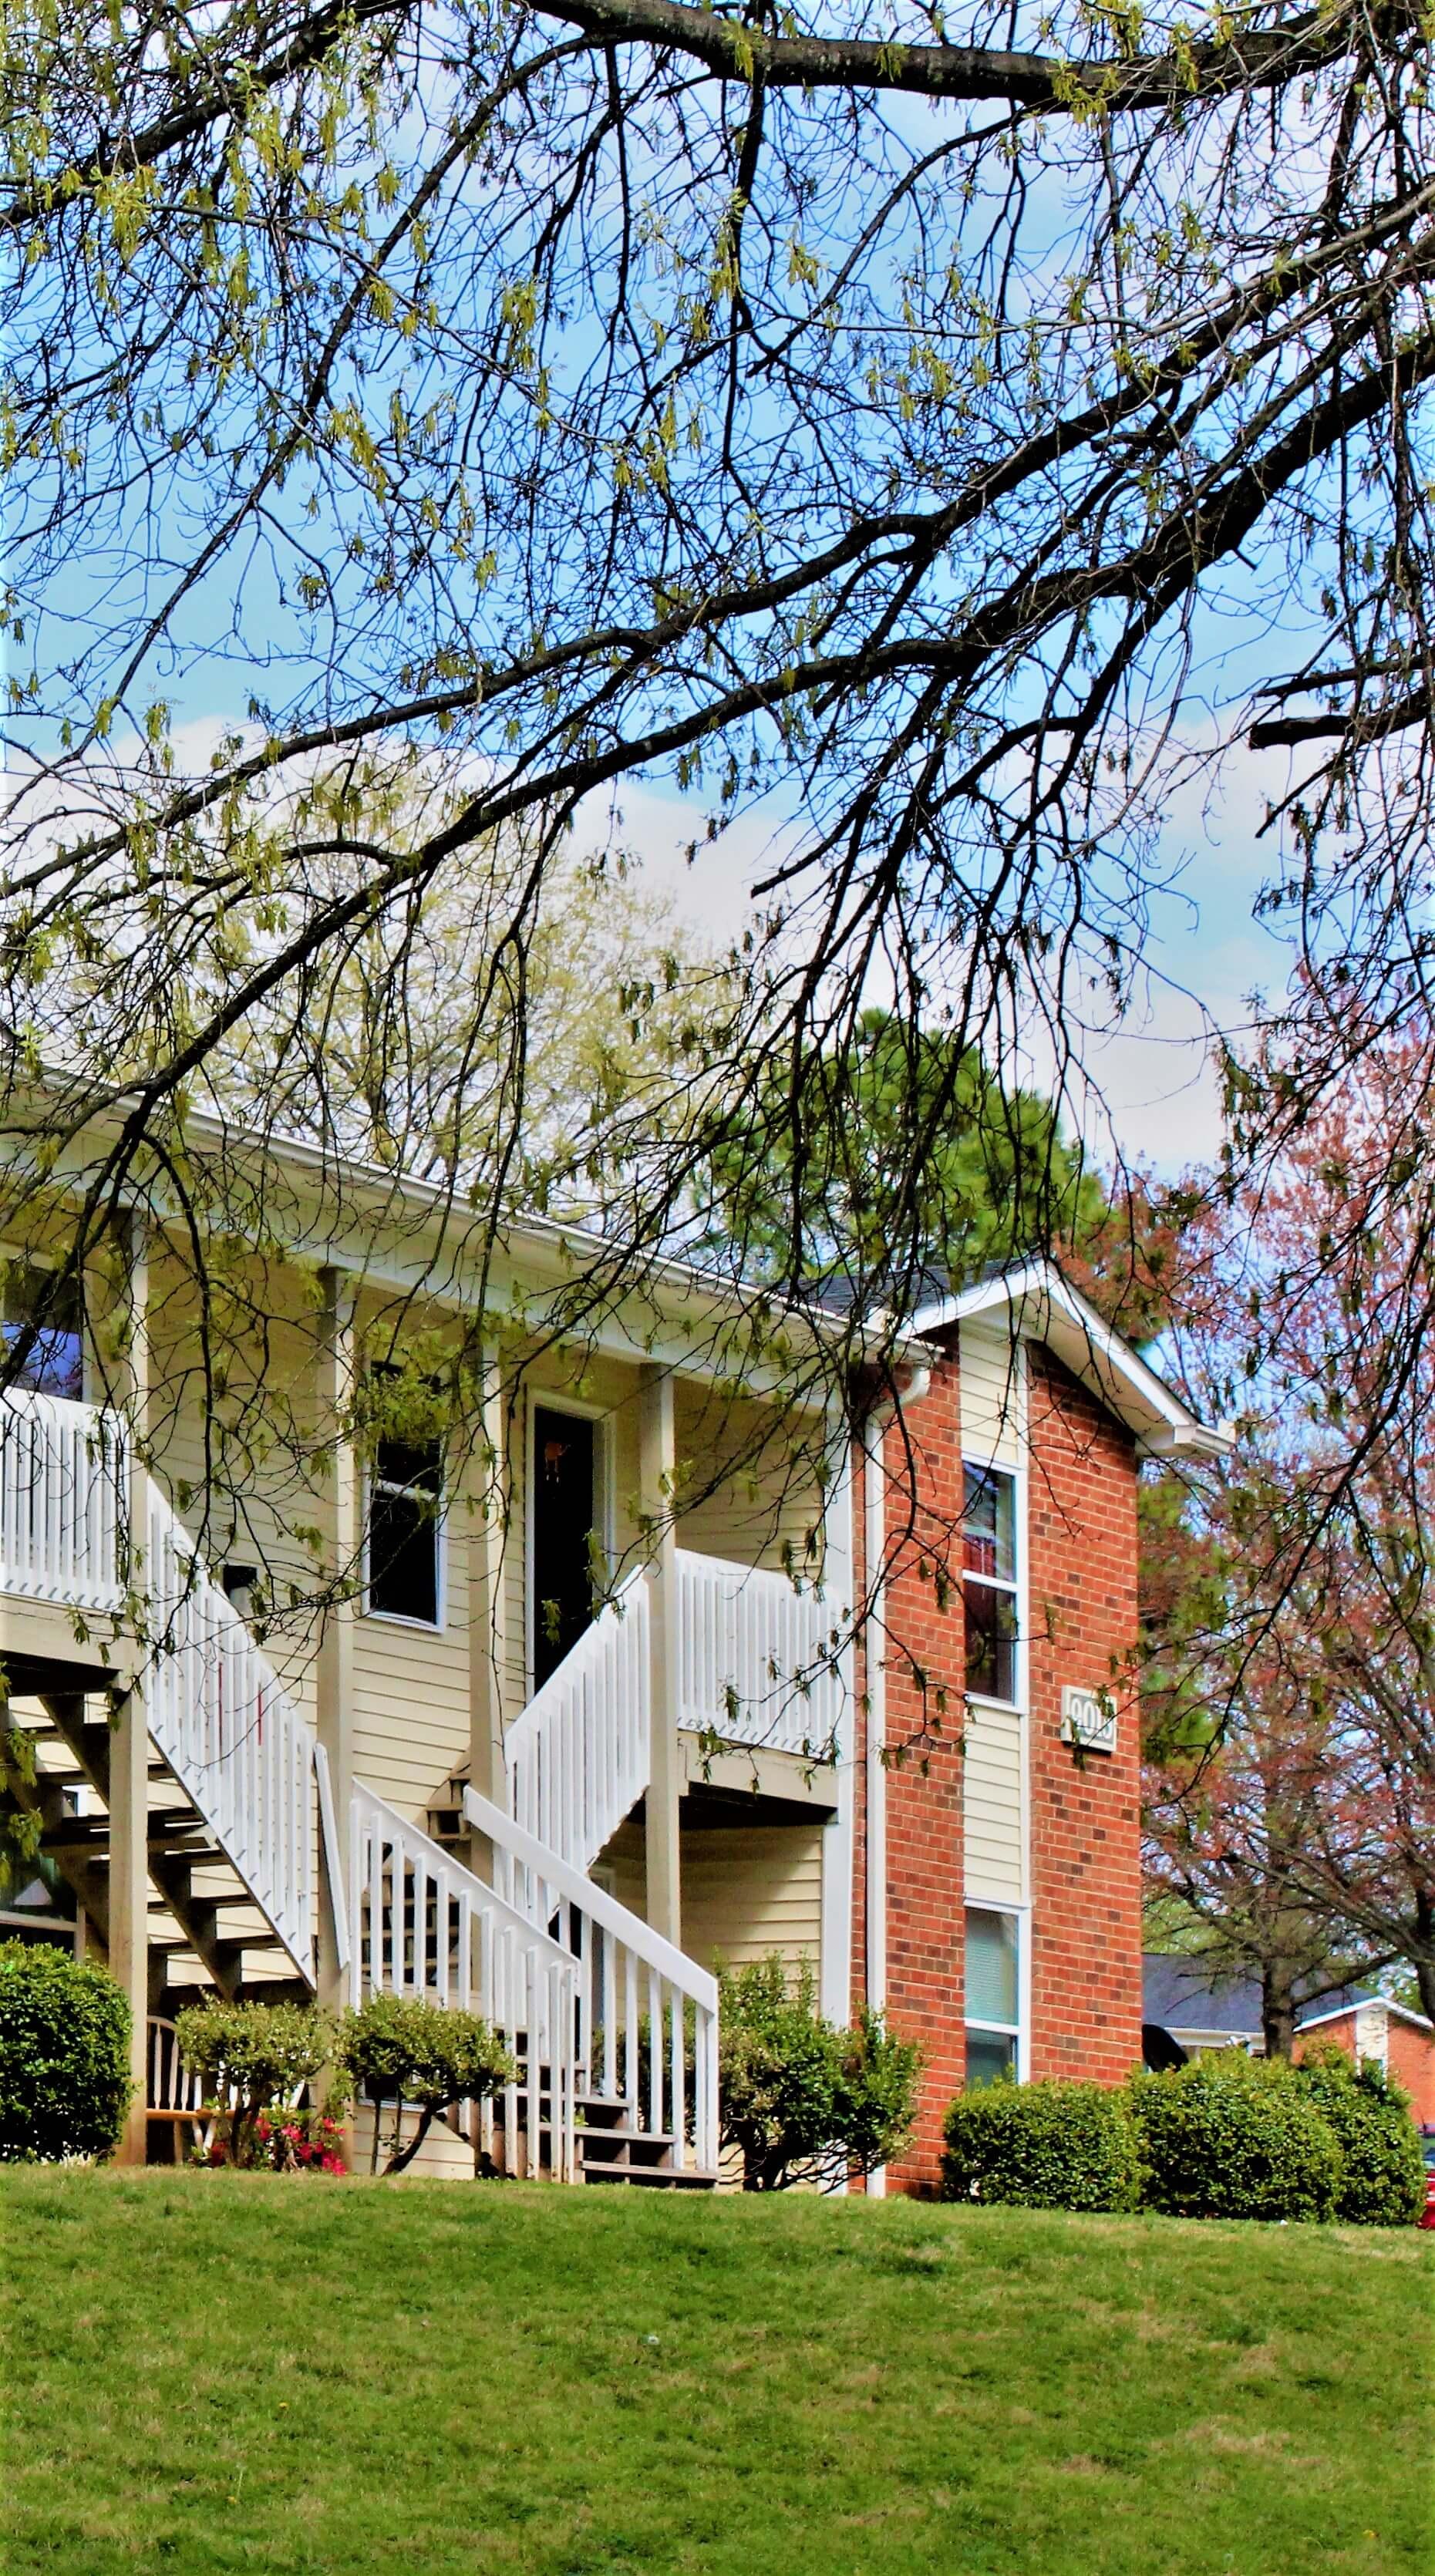 Arborgate Apartments 9056 Arborgate Dr Charlotte Nc 28273